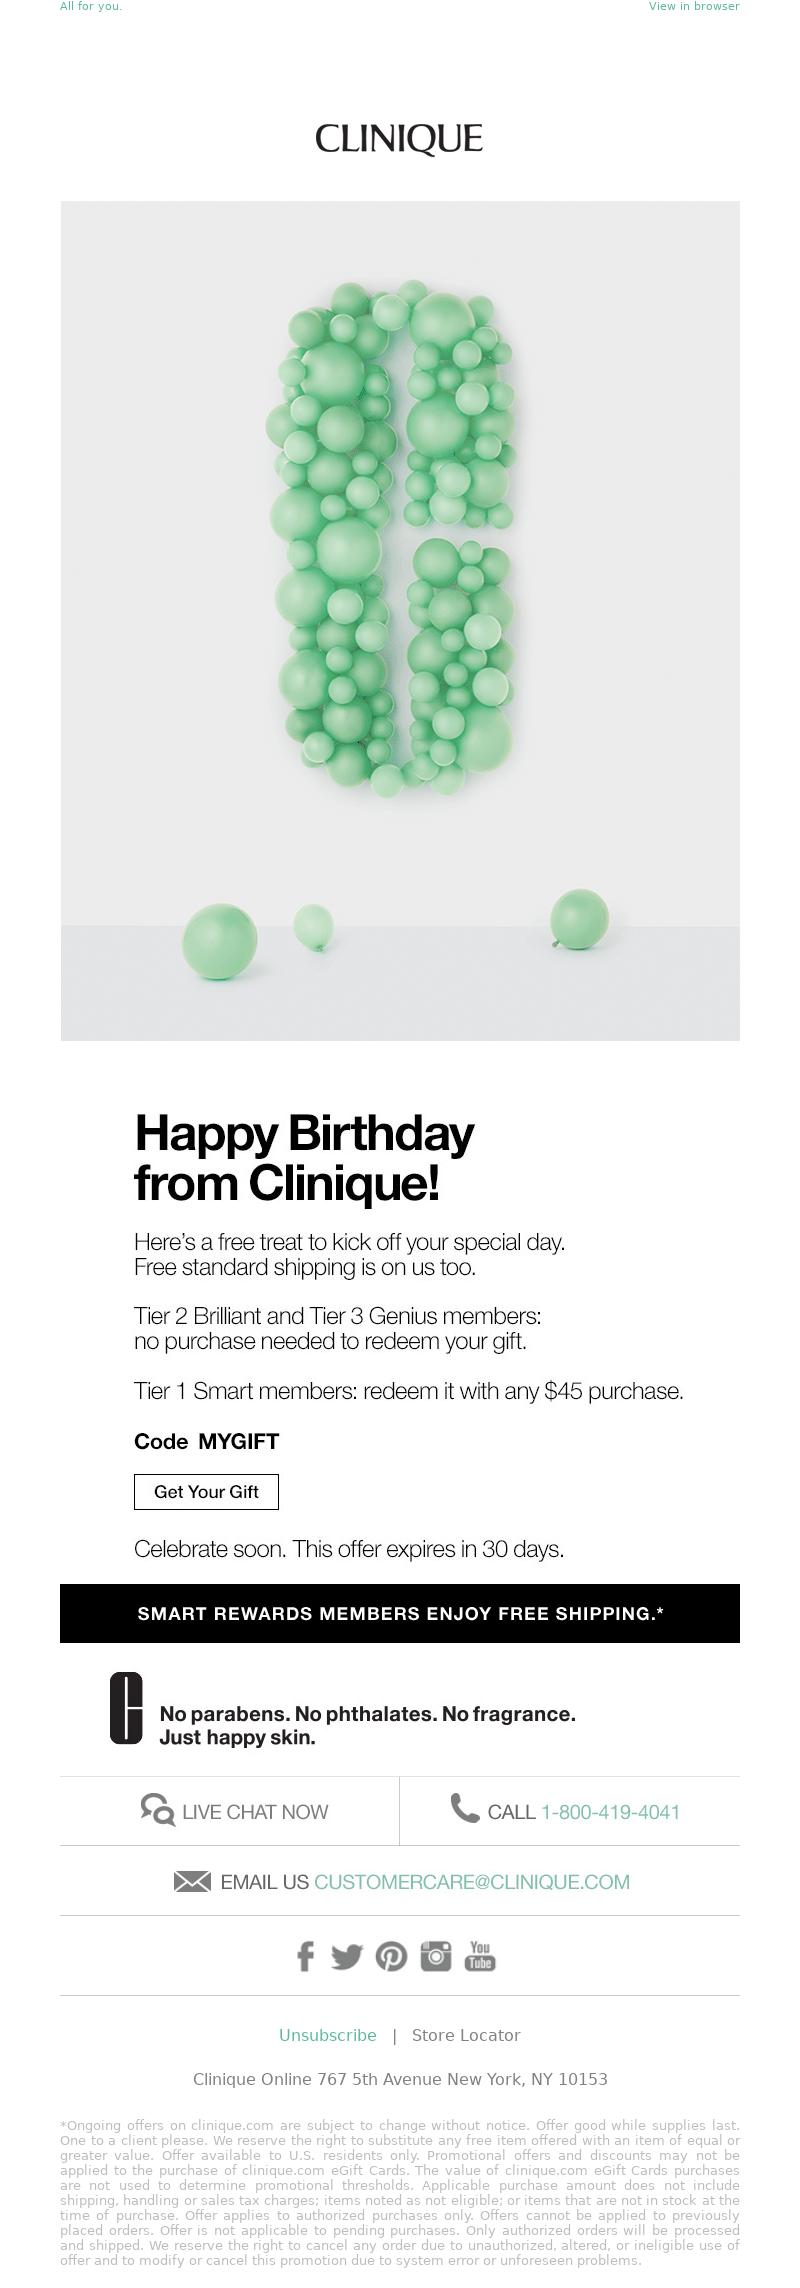 Clinique - Happy birthday! Enjoy this special treat.